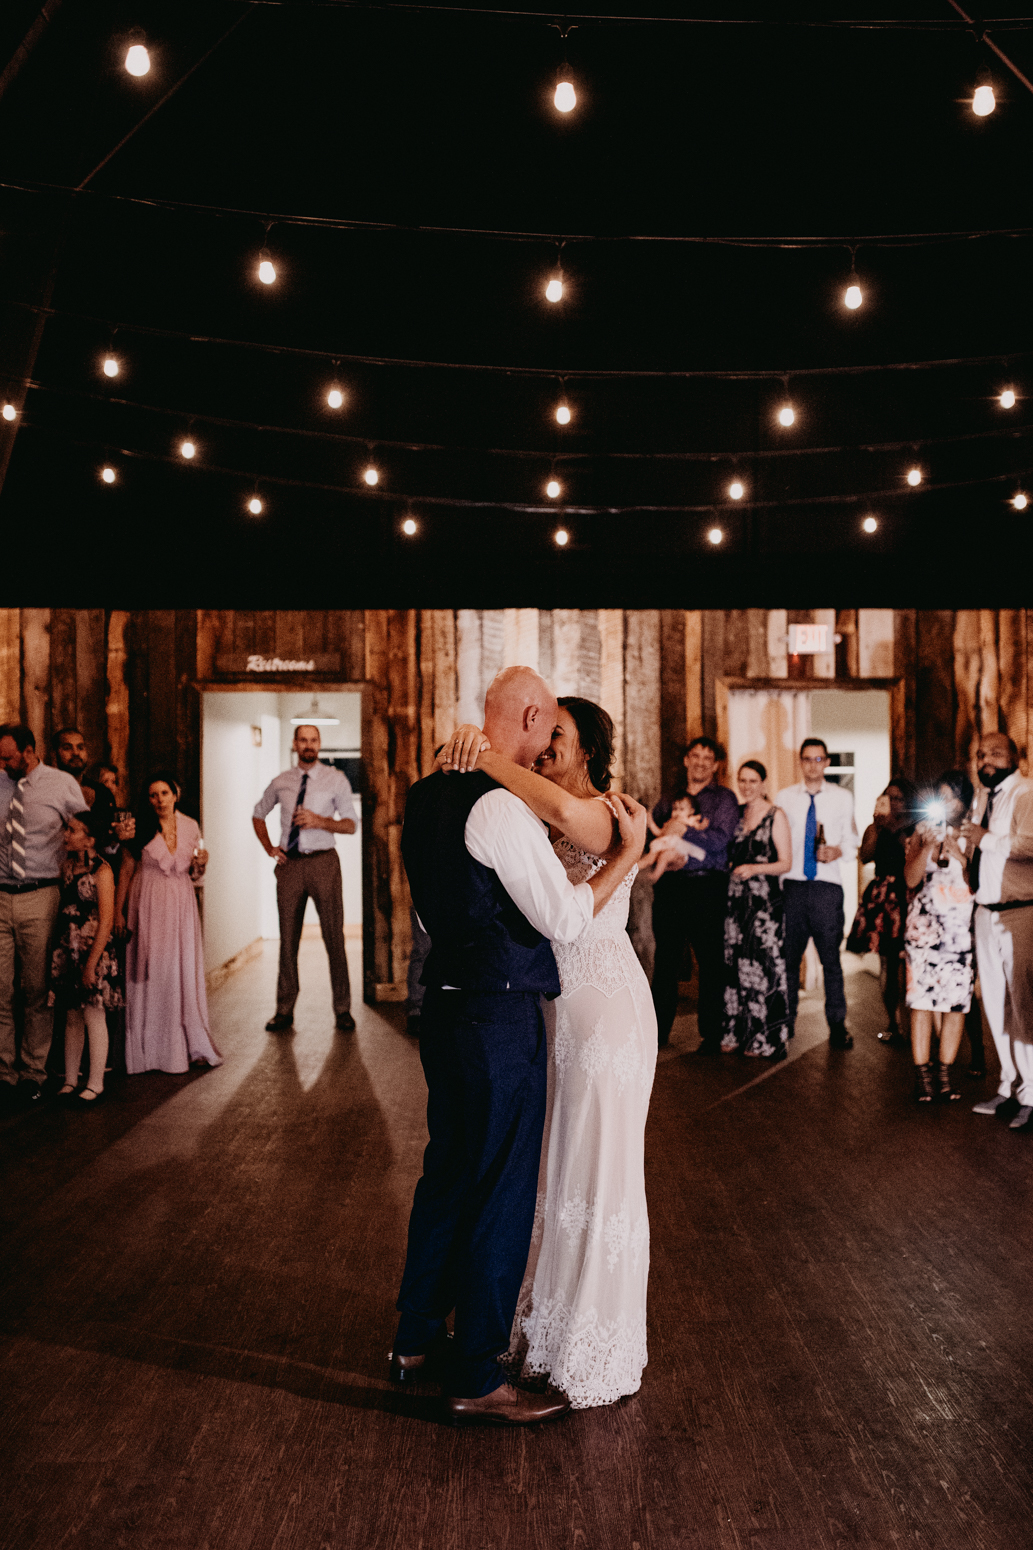 Rochester, NY Wedding Photographer (130 of 133).jpg